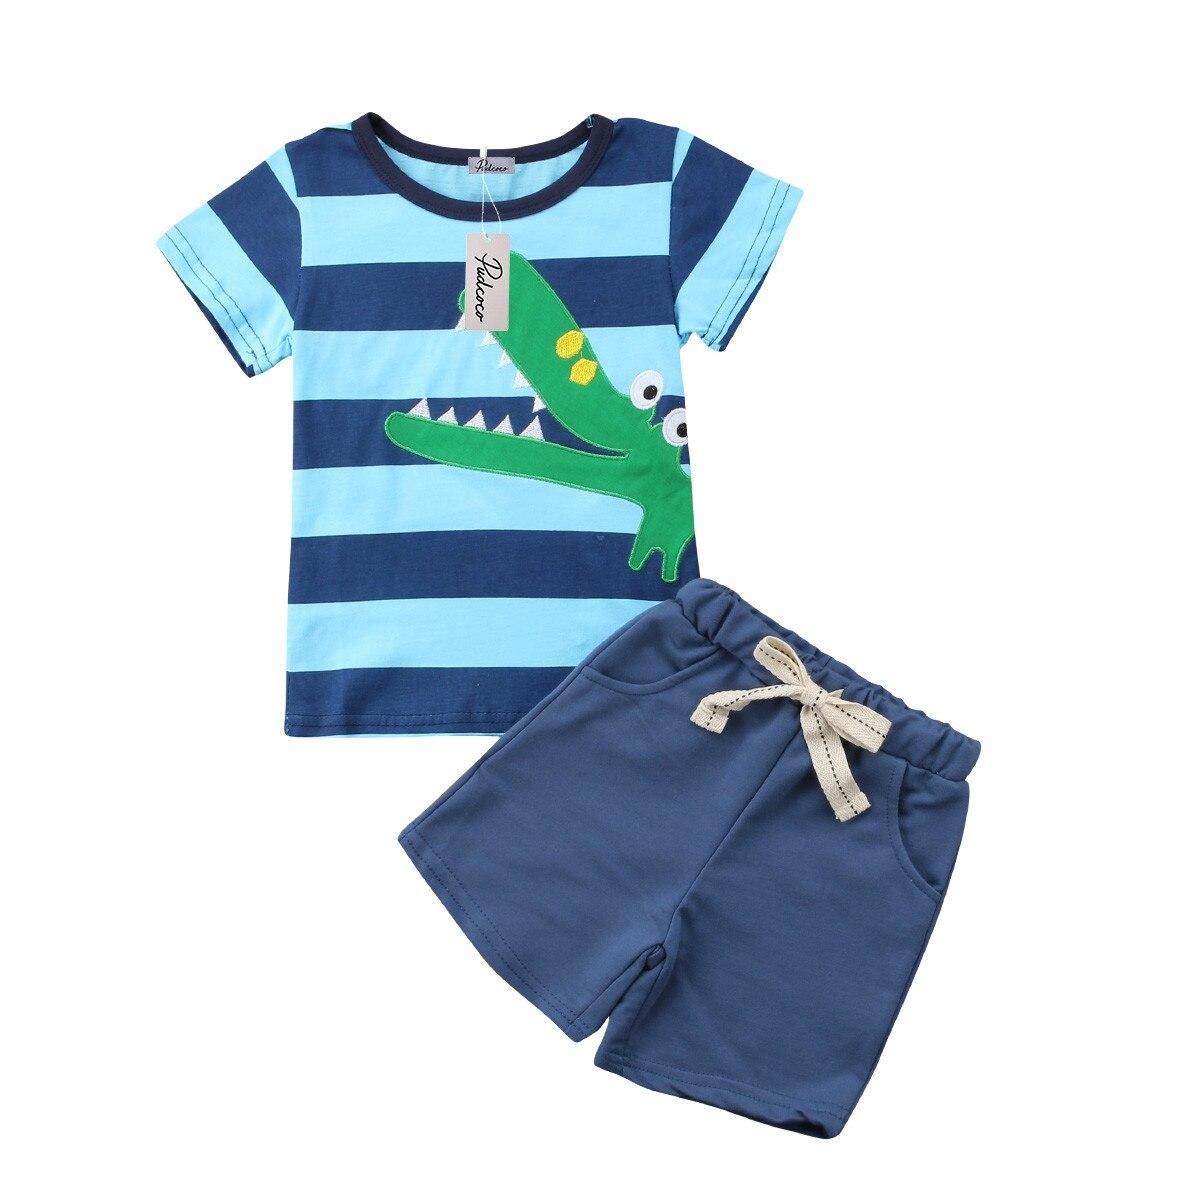 Girls' Clothing Clothing Sets 2pcs Newborn Kids Baby Girls Elephant T-shirt Short Sleeve Tops Half Pants Summer Loose Clothes Set Outfits